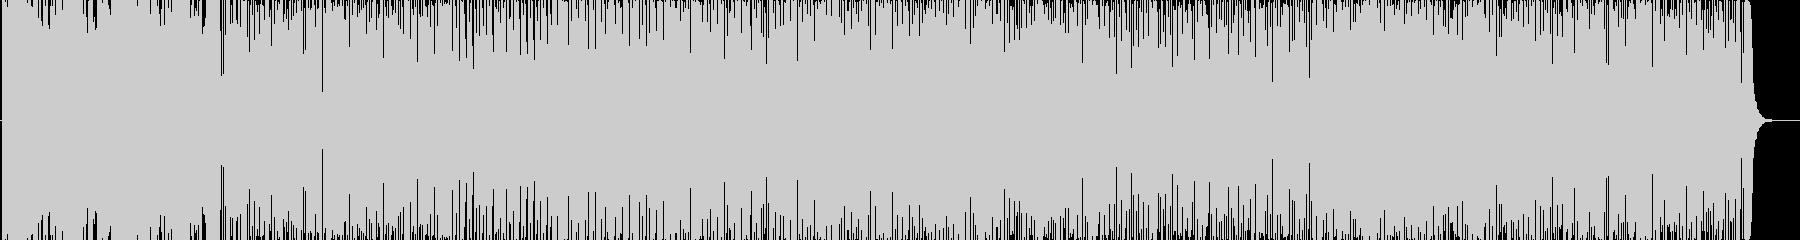 ■GoPro-レトロシンセポップ-ダンスの未再生の波形